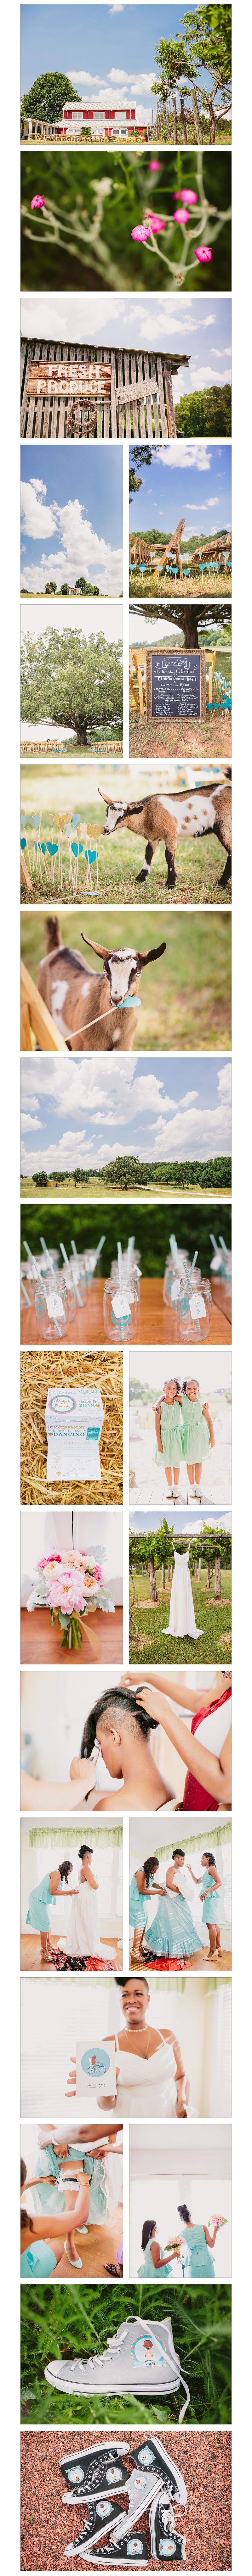 atlanta-farm-wedding-1.jpg